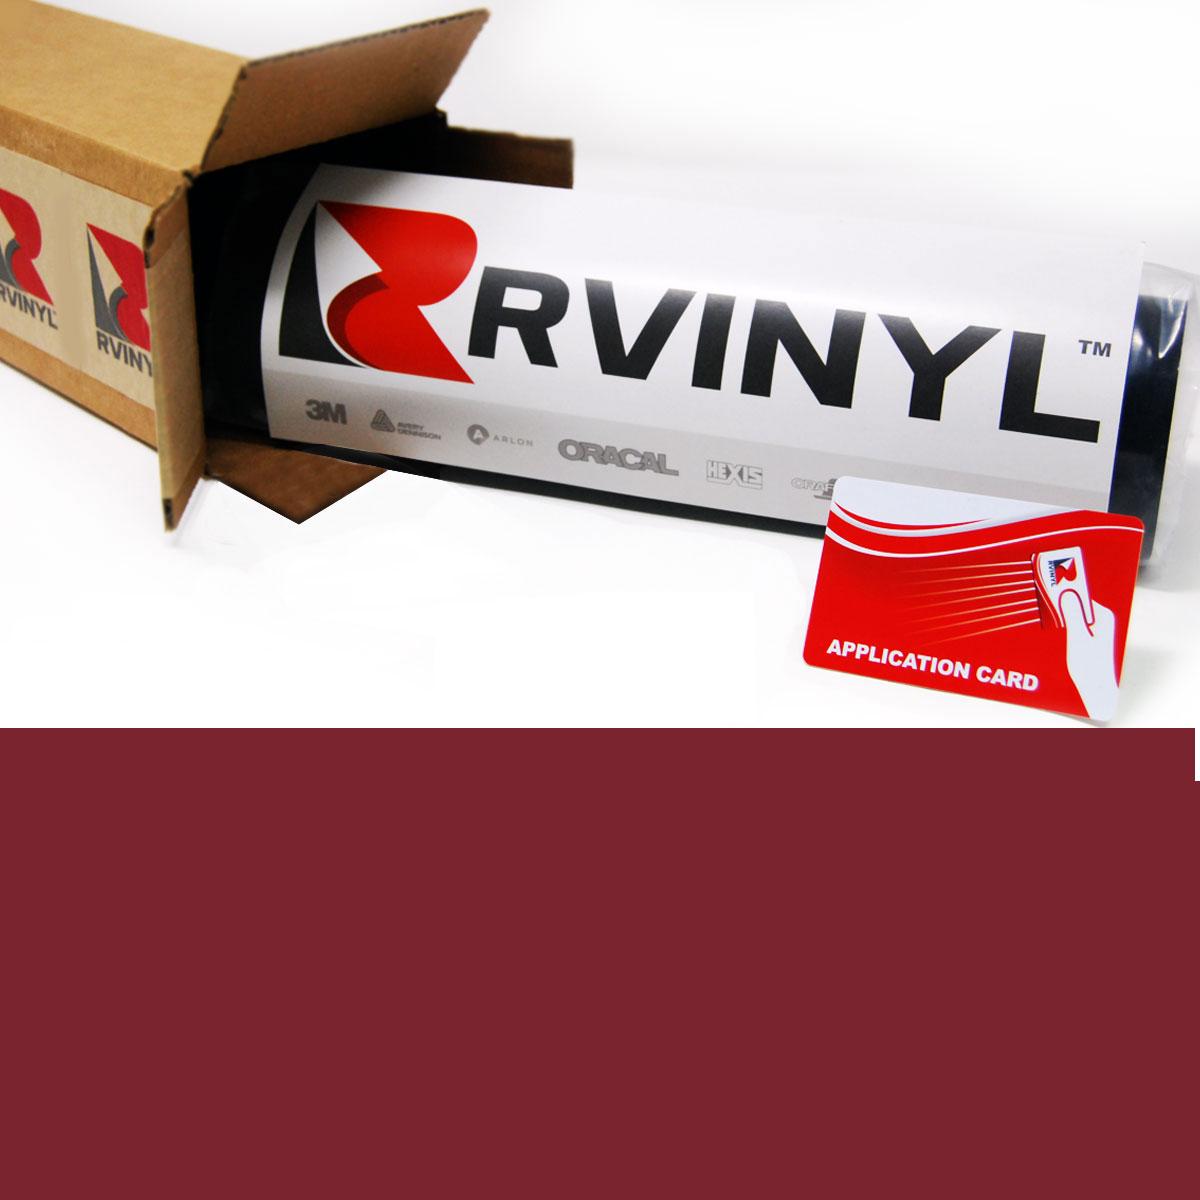 Avery™ UC900 Translucent Vinyl Film - Maroon Pantone 188 C